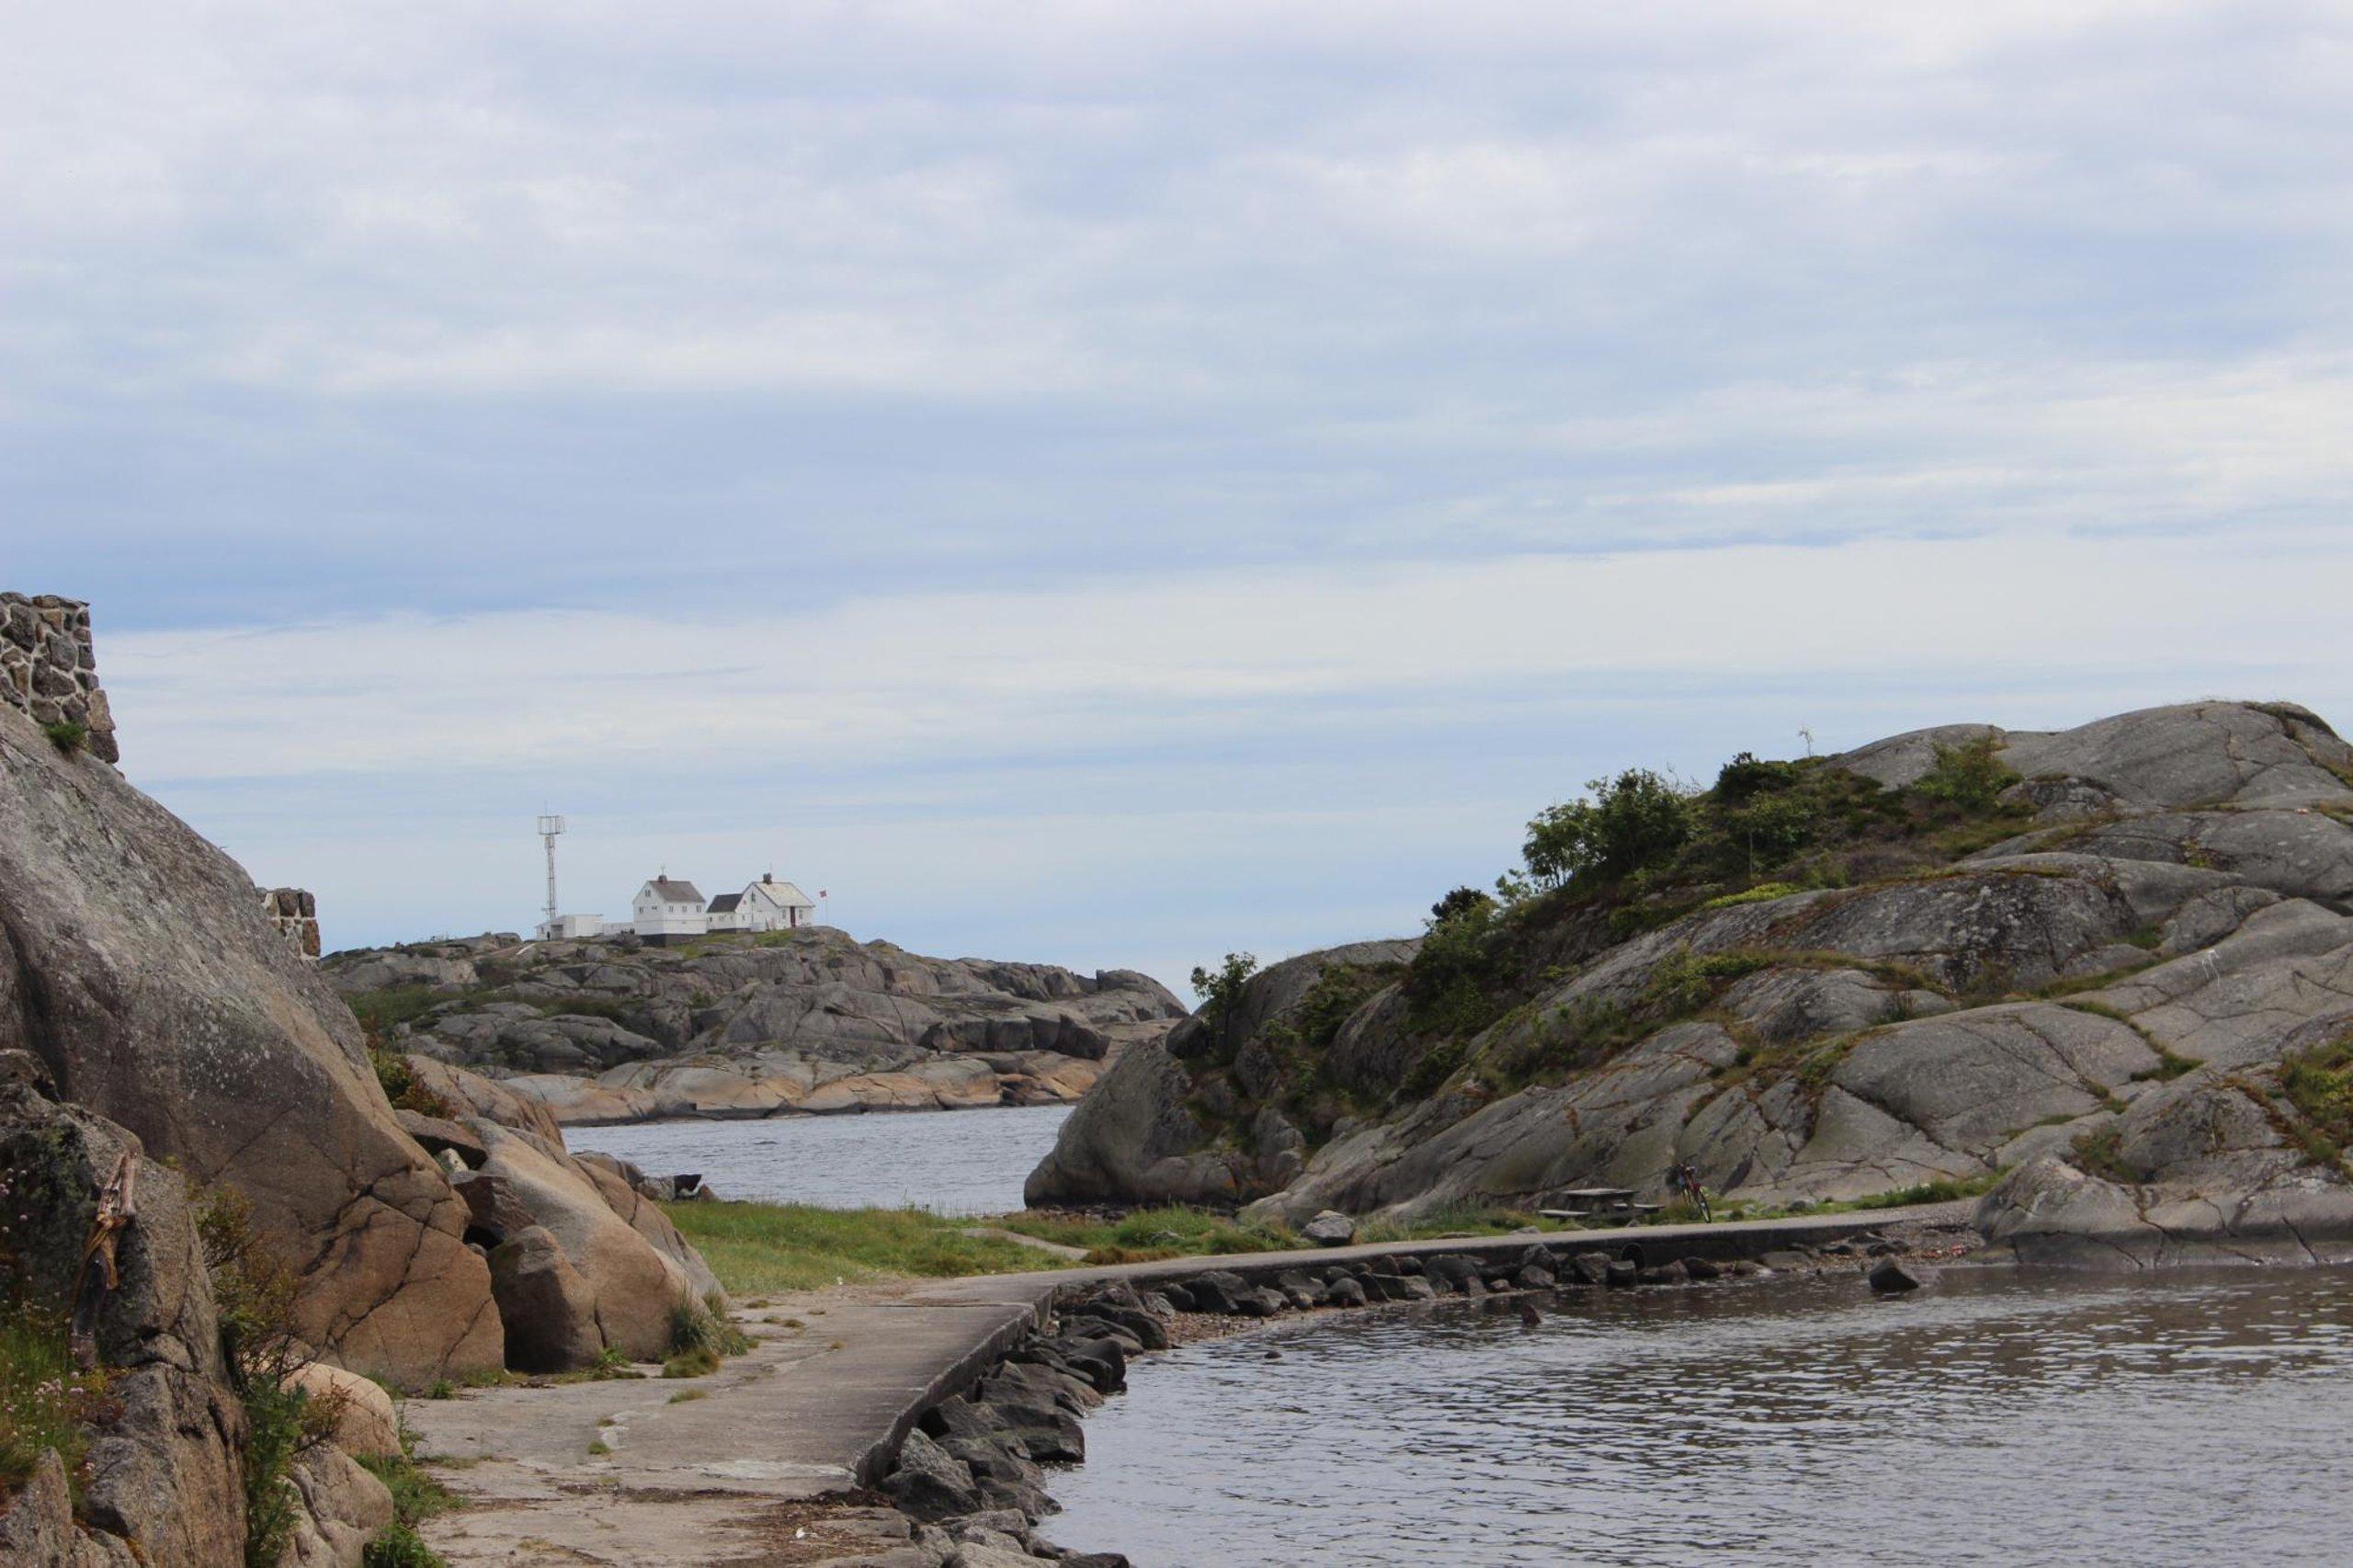 Norge Dating Stavern, Datingside Skjåk